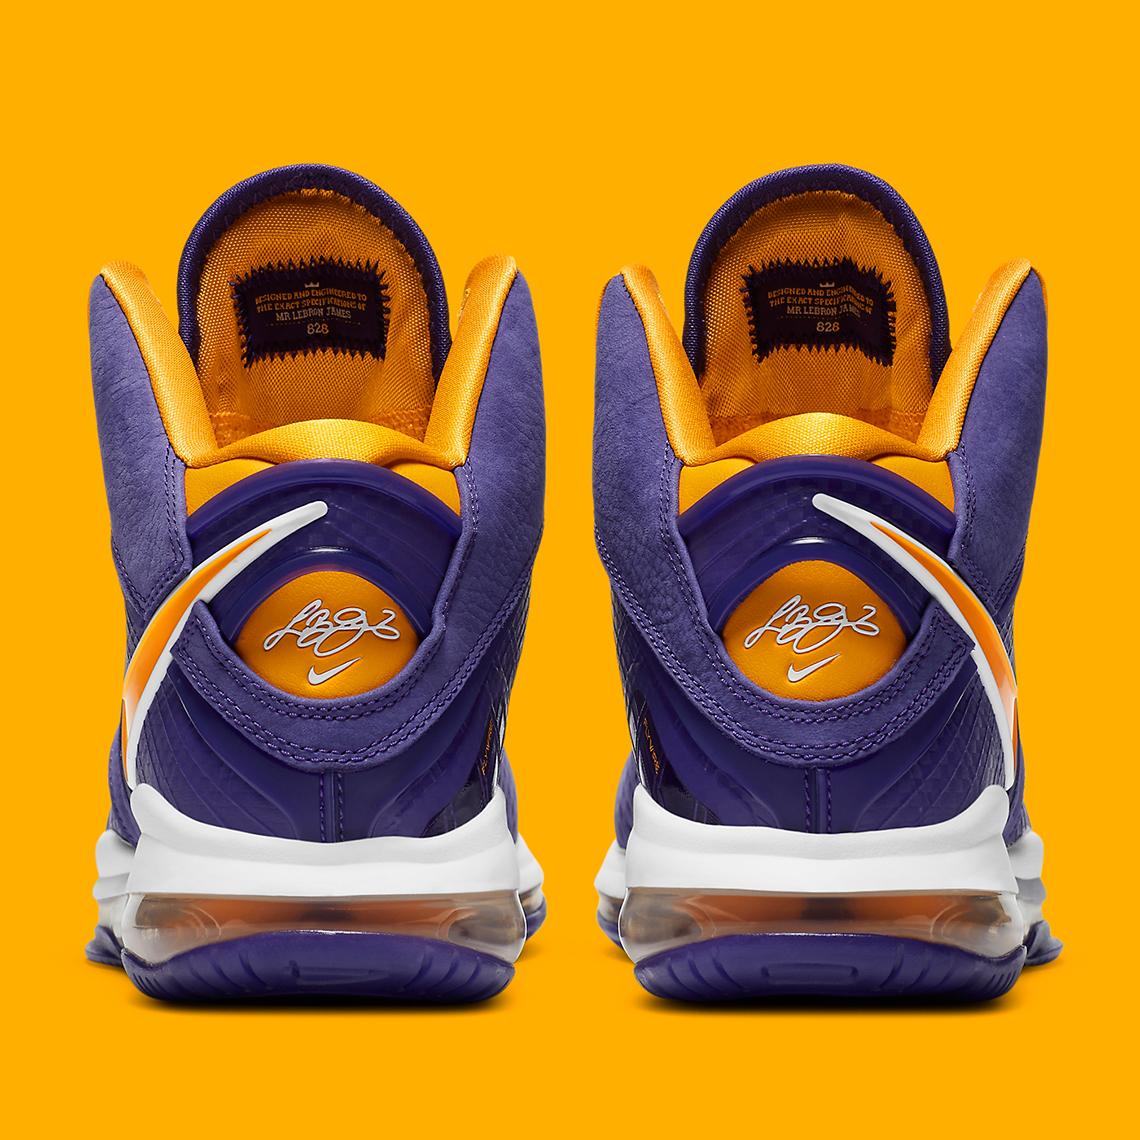 Nike LeBron 8 Lakers DC8380-500 Release